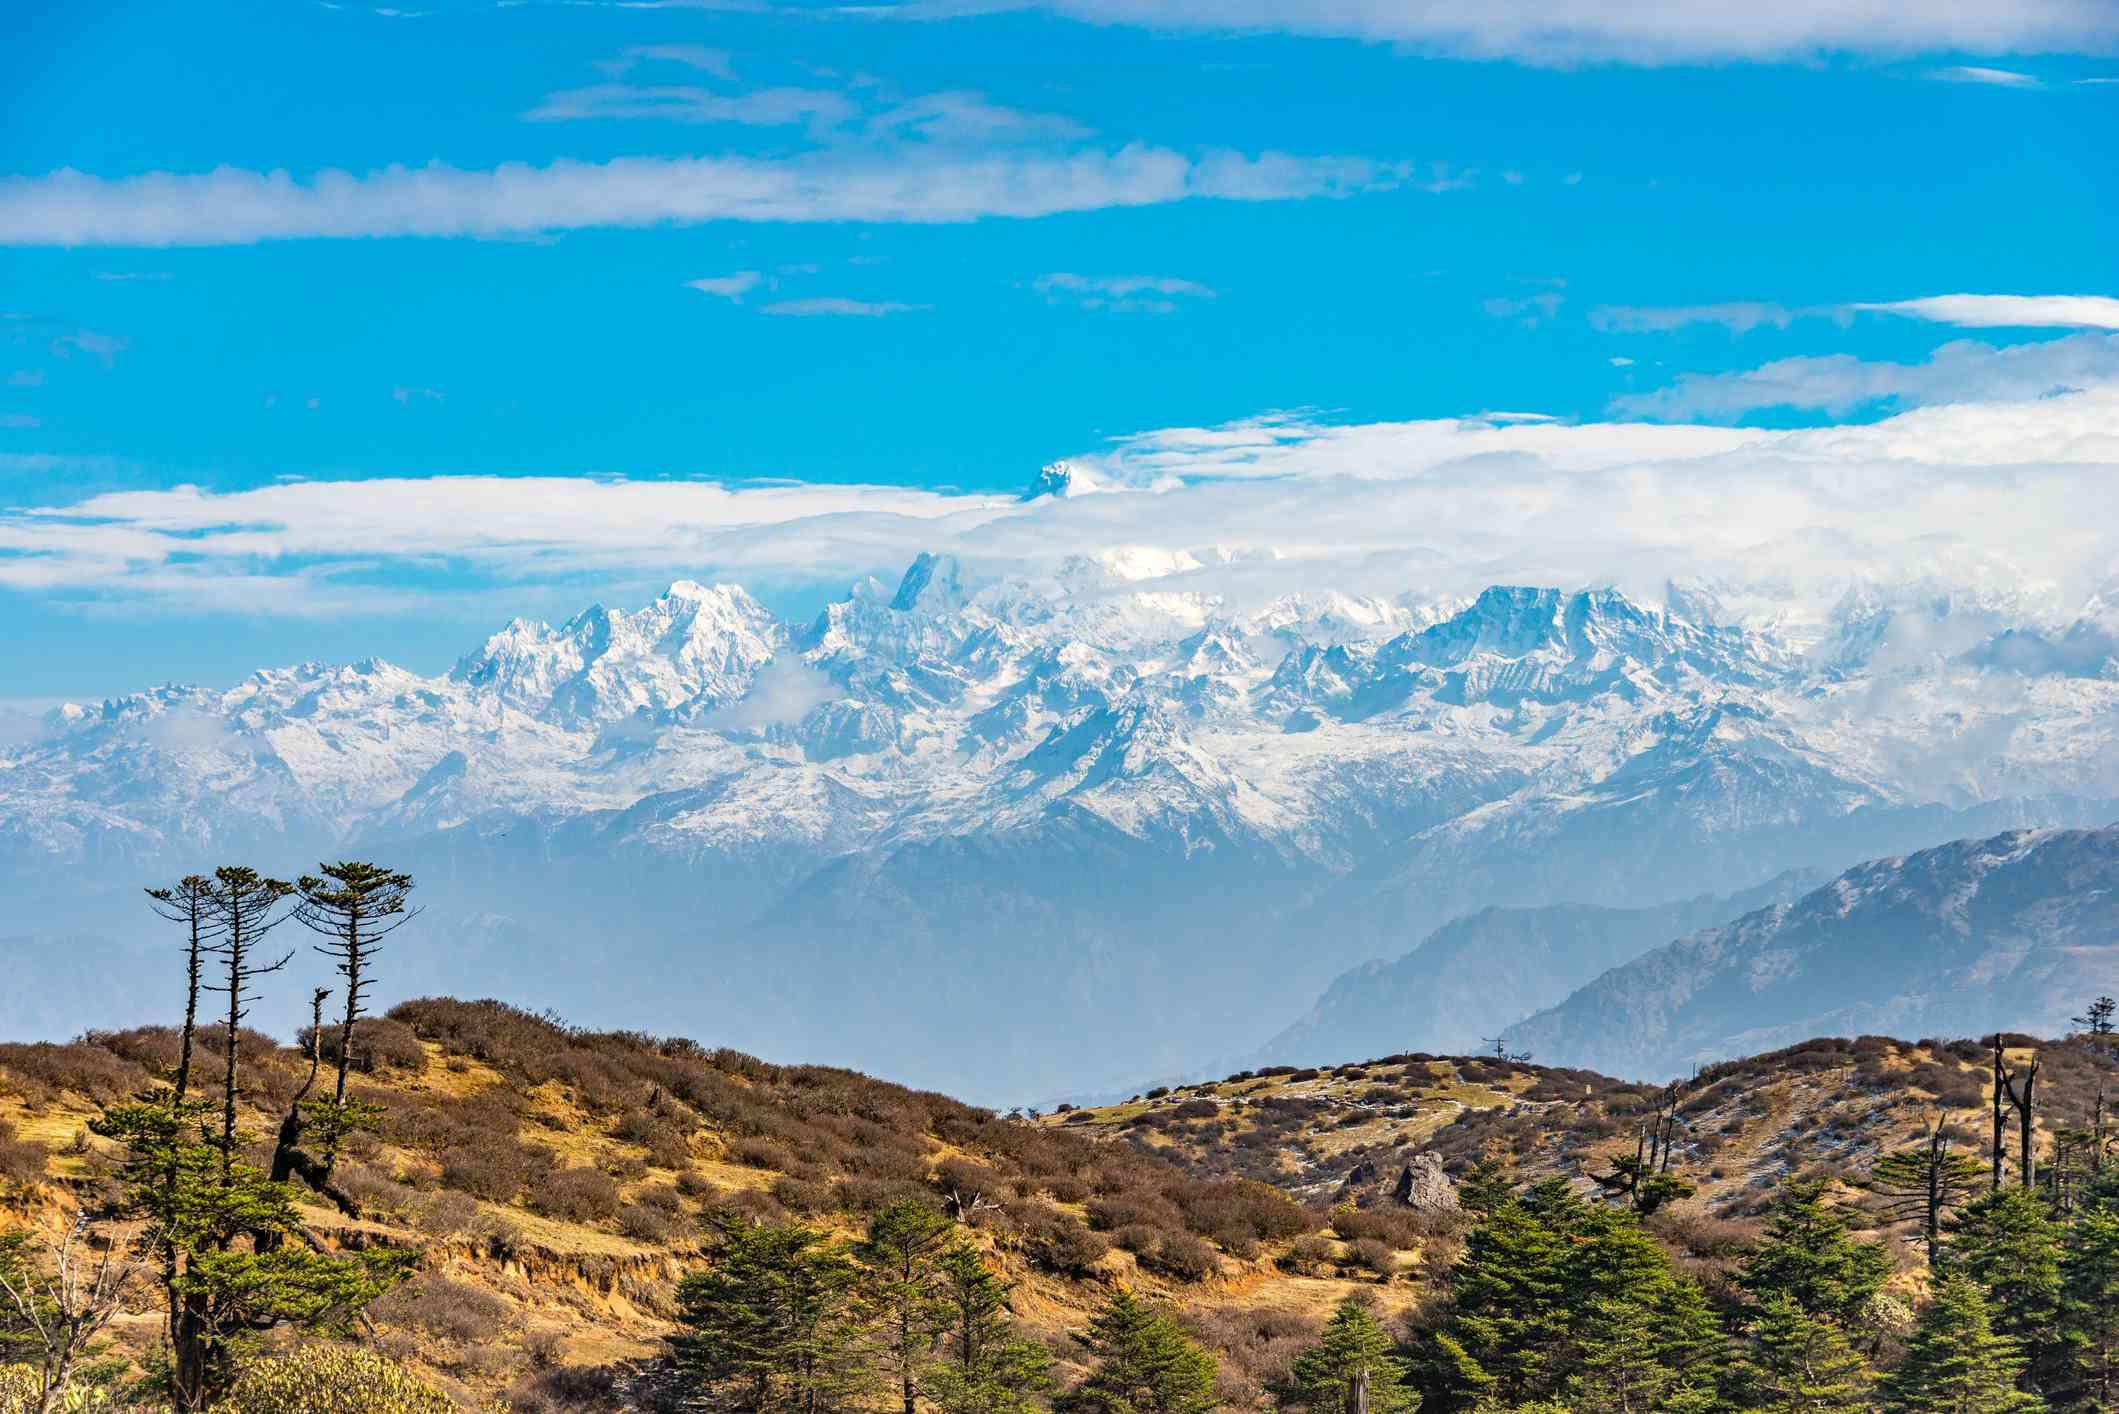 Mount Kanchenjunga from Sandakphu, West Bengal, India